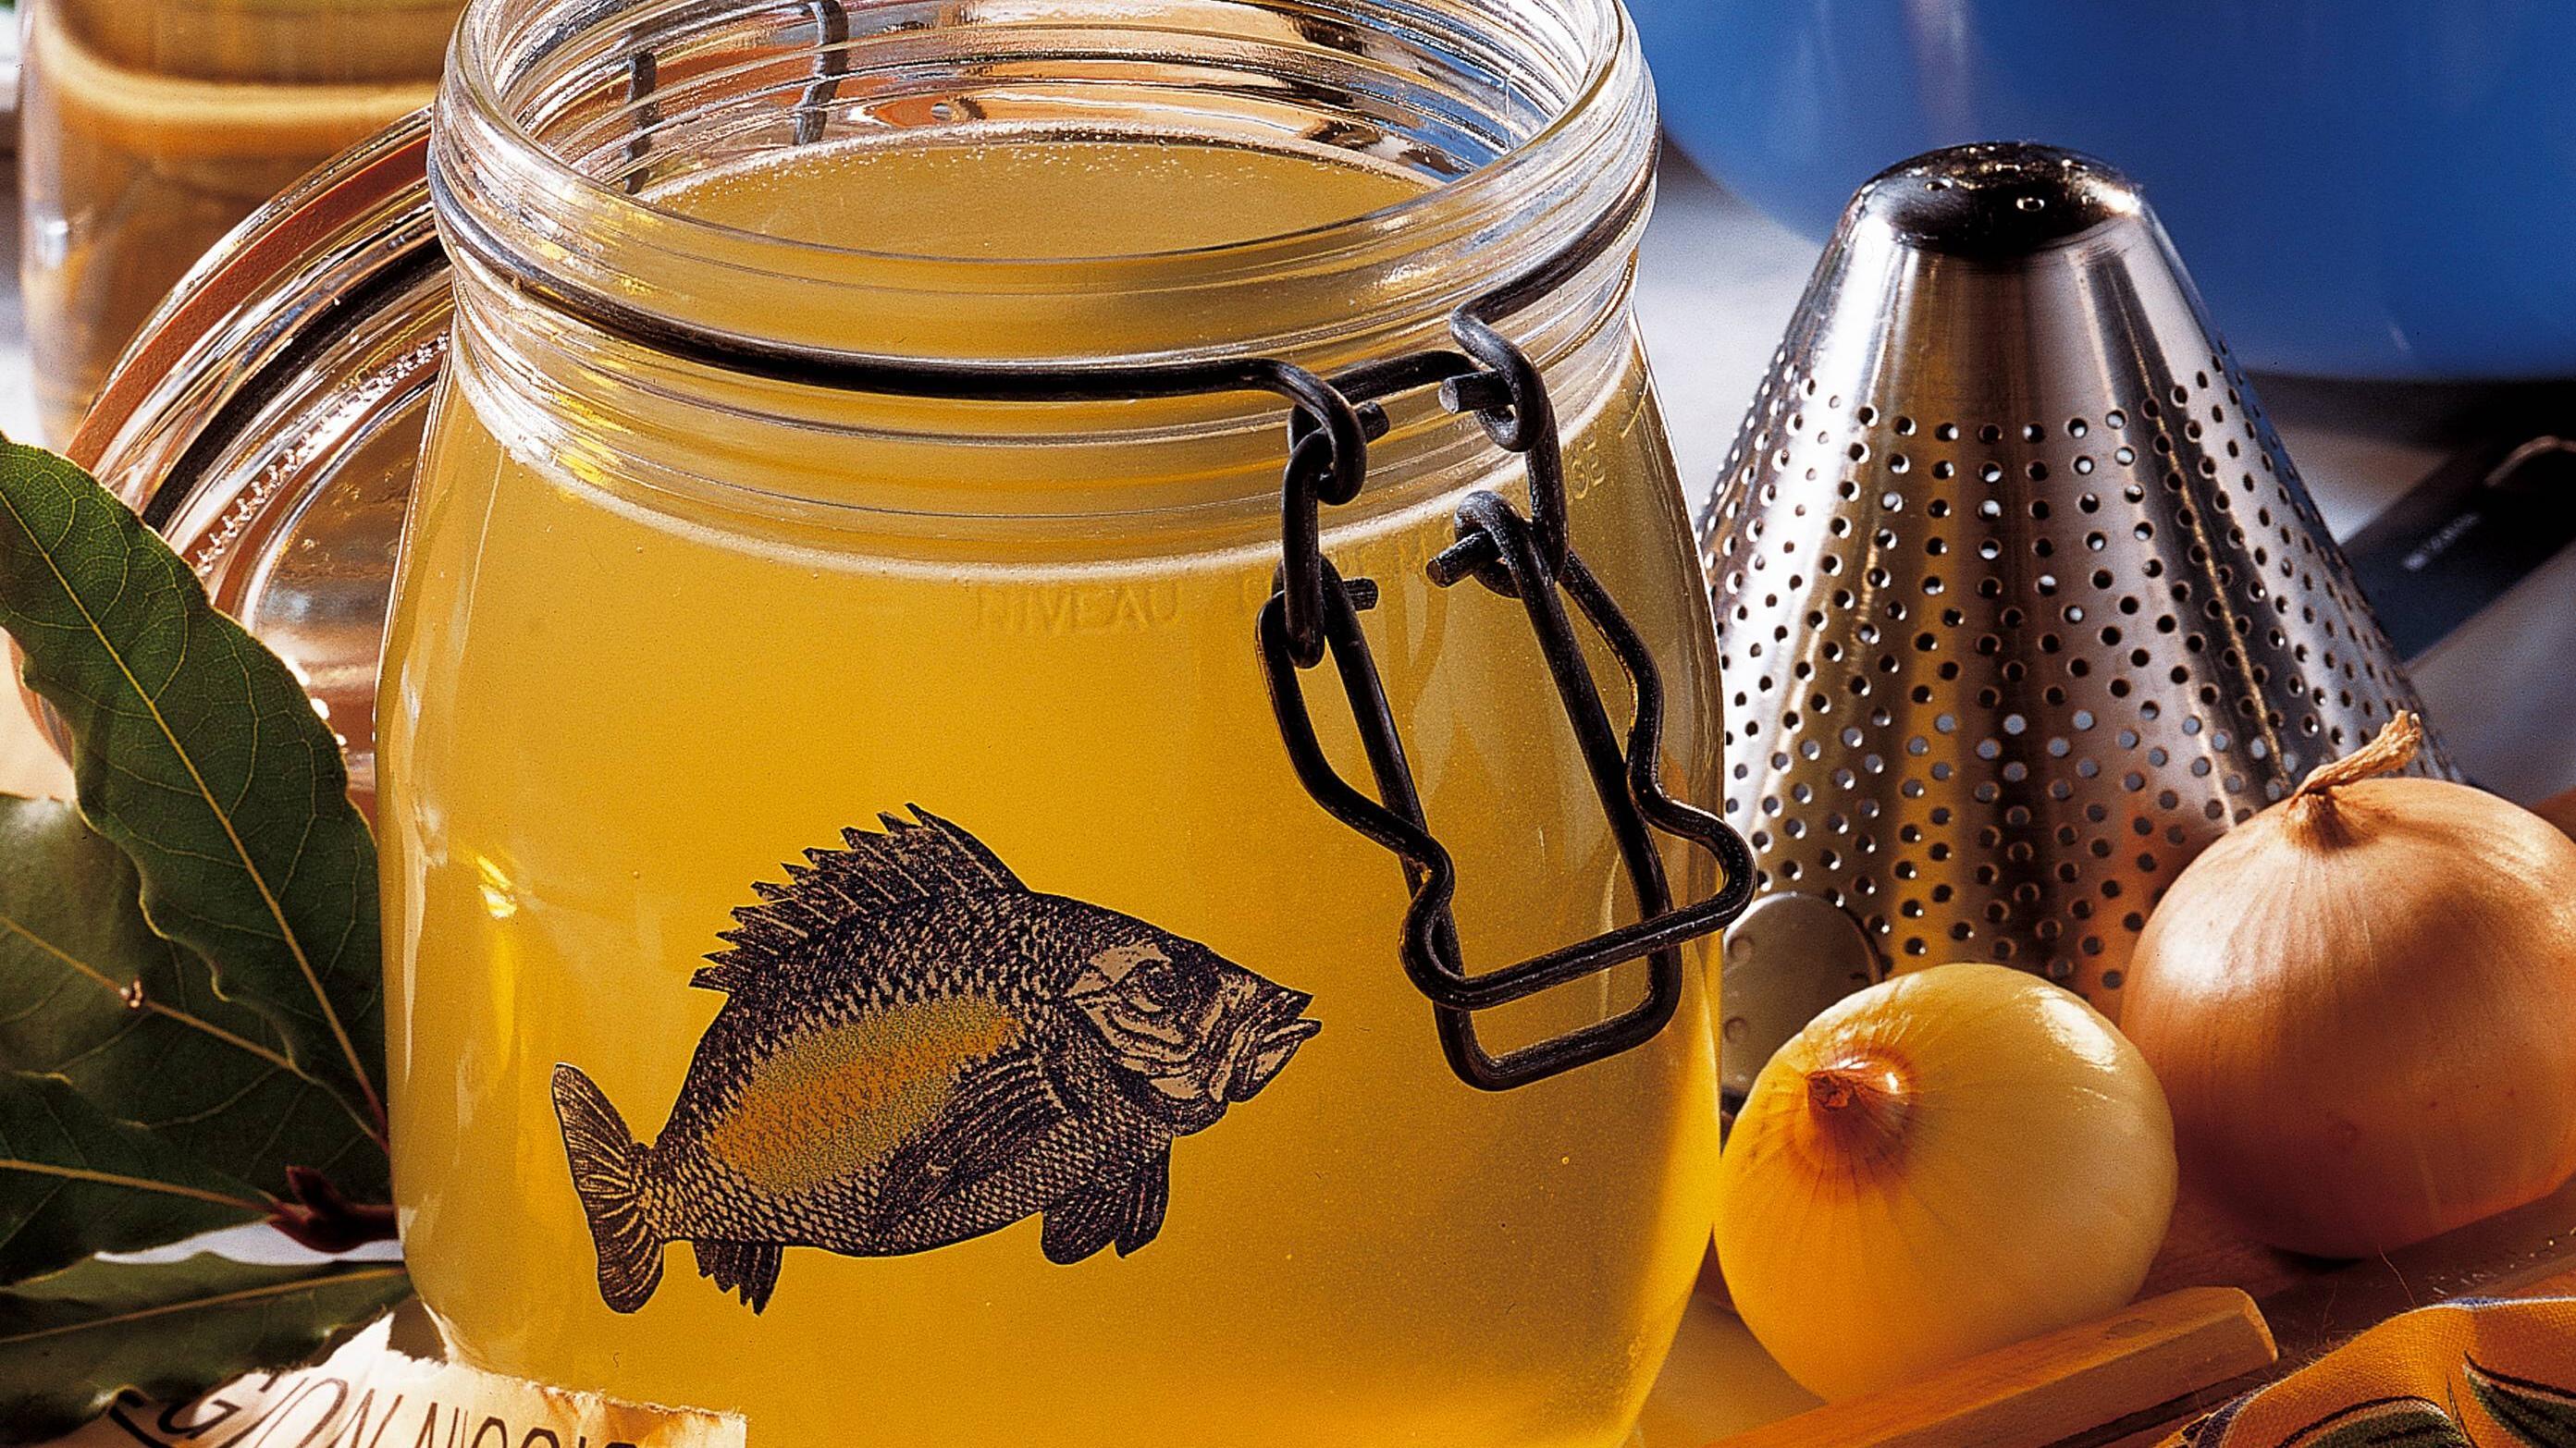 Fischfond kochen - ganz einfach selbst gemacht